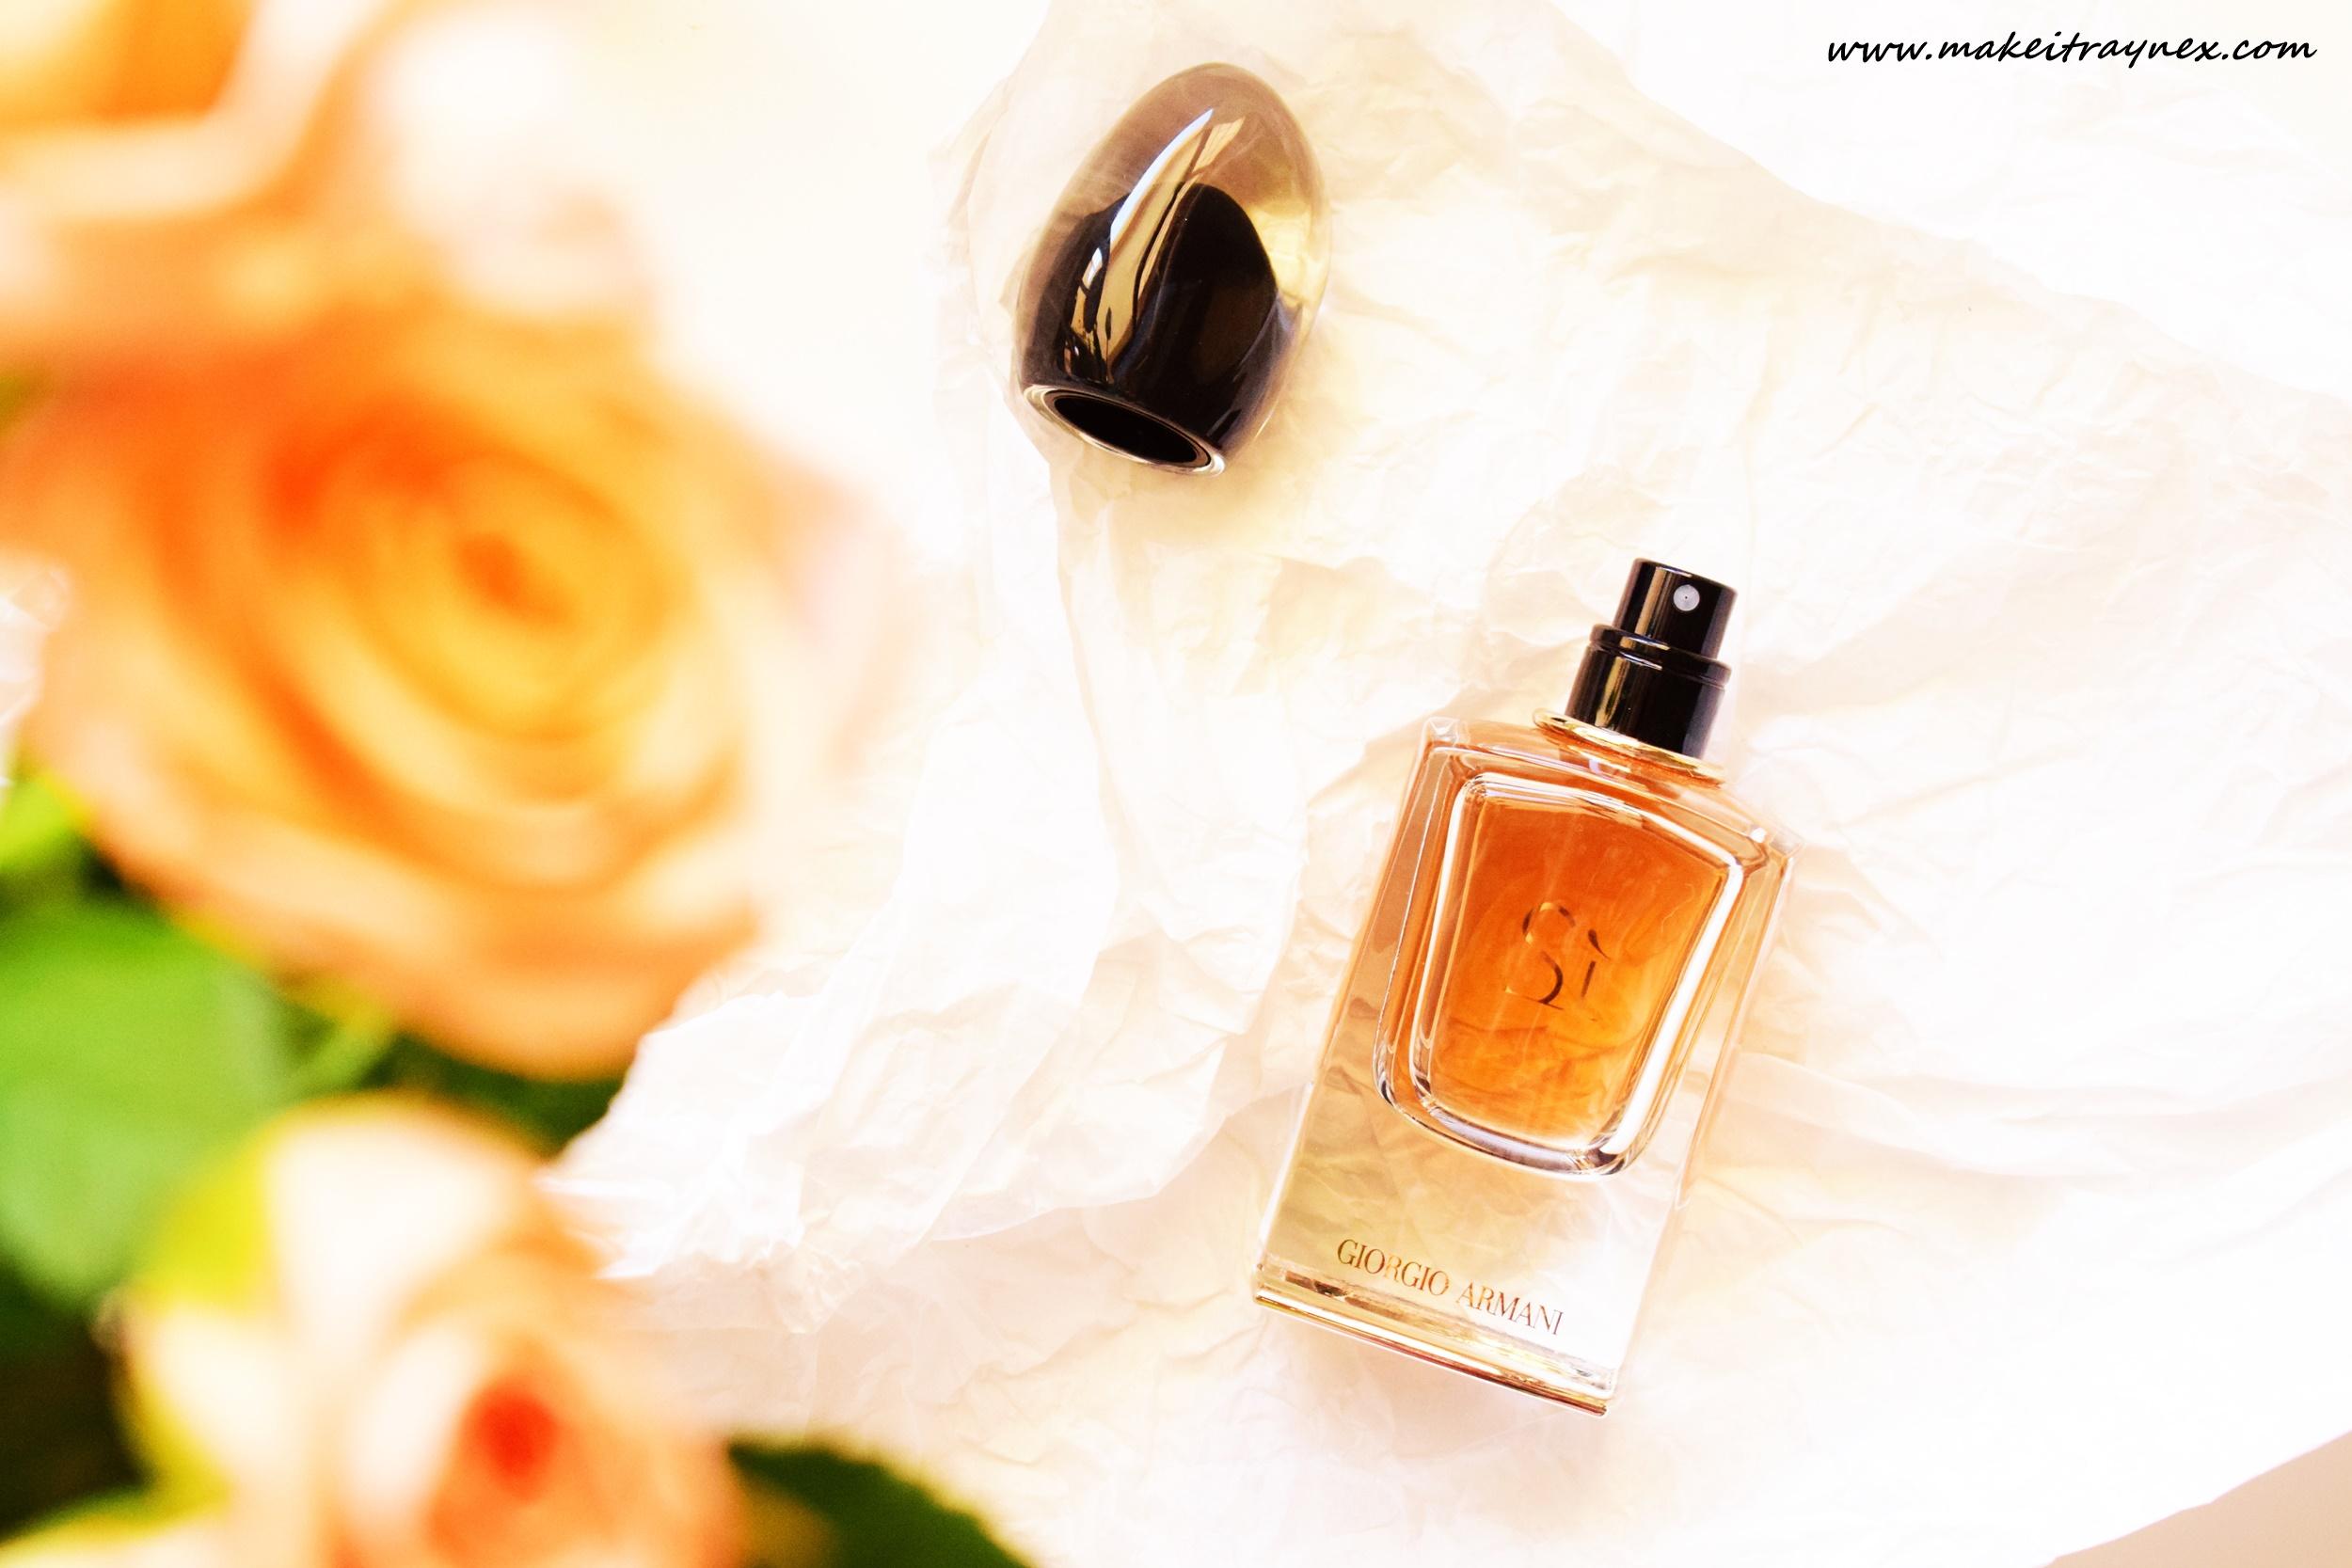 Armani Si Le Parfum from Giorgio Armani {THE FRAGRANCE CHRONICLES}